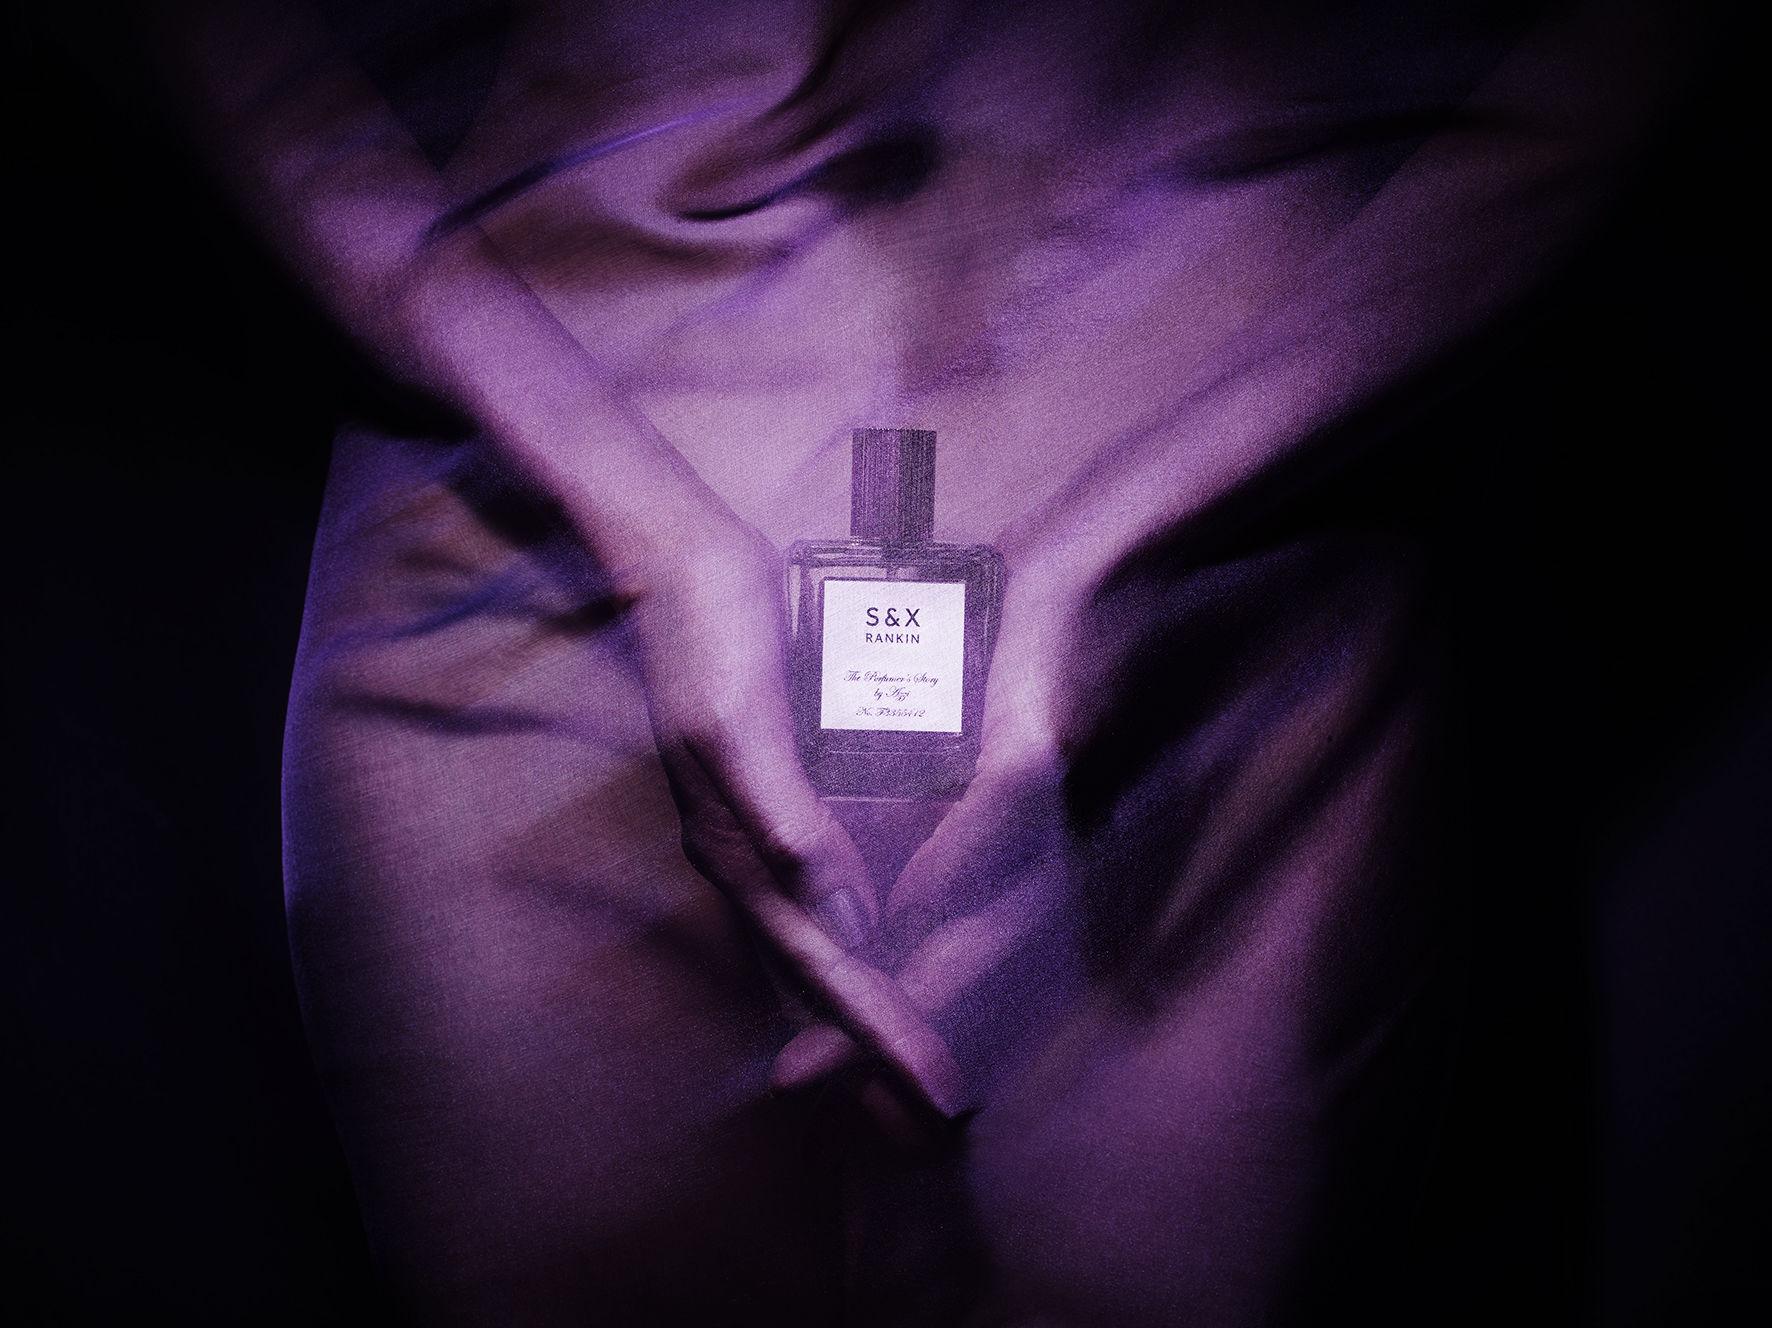 RANKIN PHOTOGRAPHY LTD - unisex perfume S&X in cooperation with perfumer Azzi Glasser